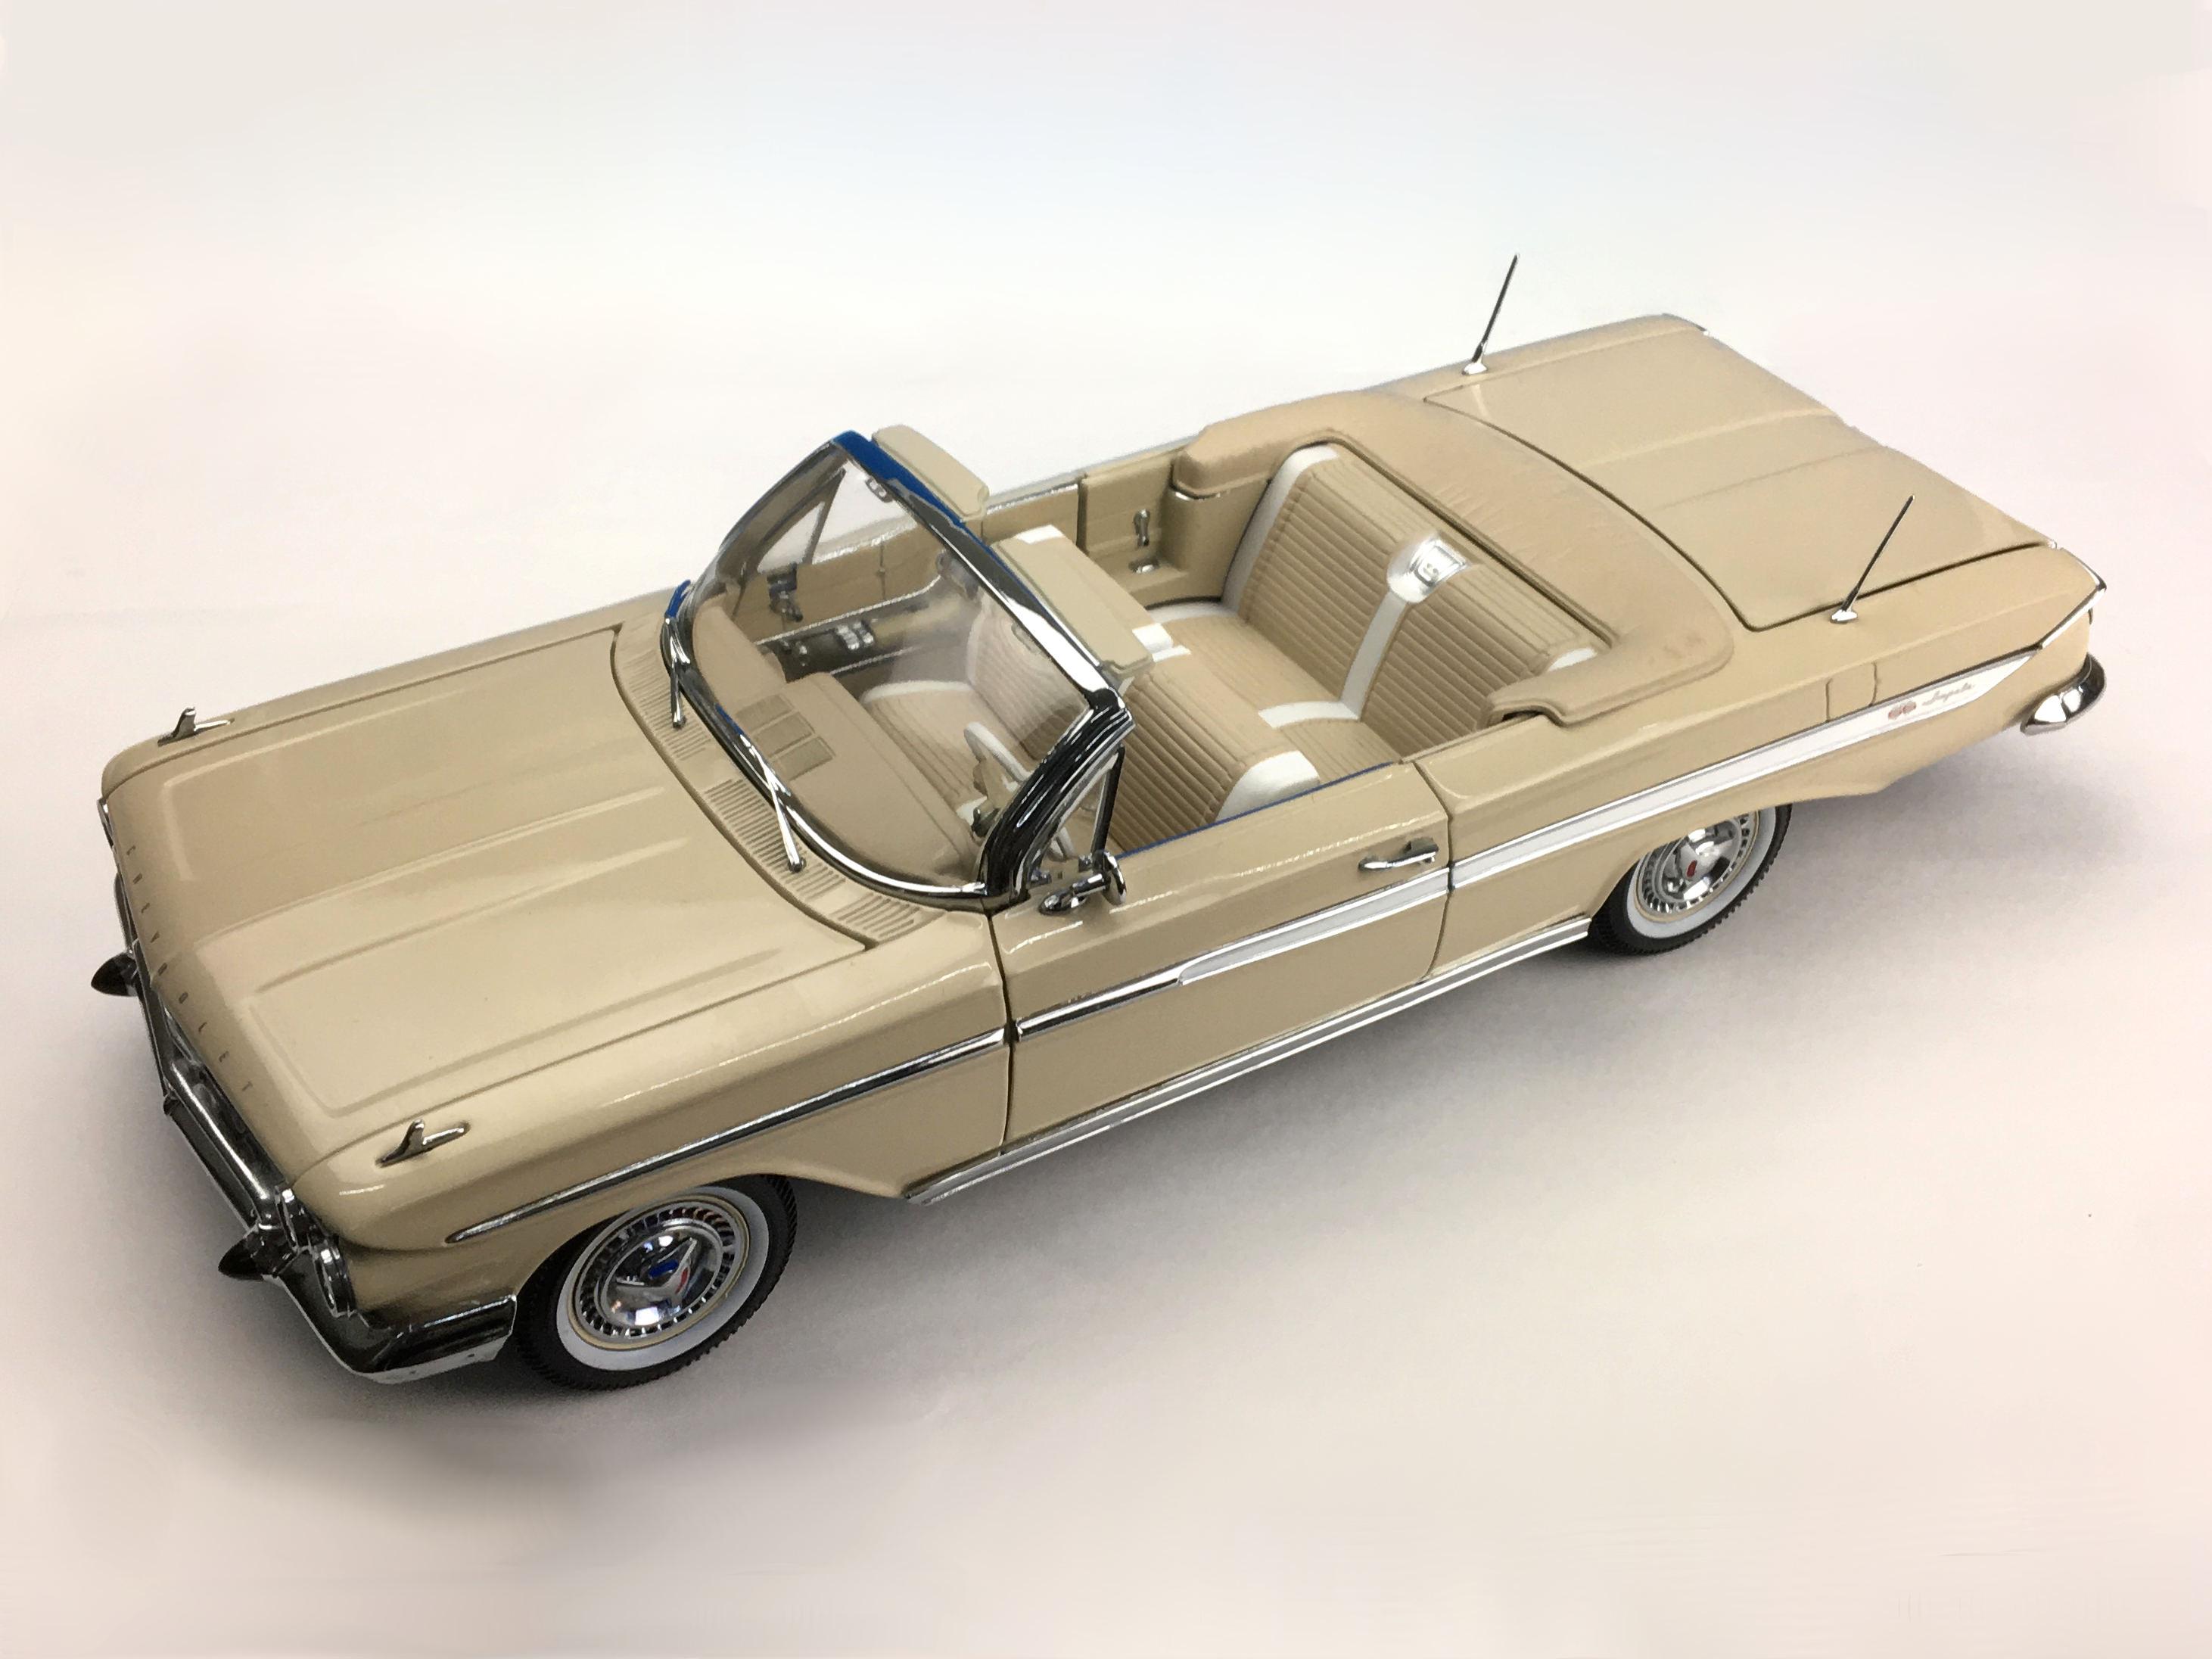 SunStar/サンスター シボレー インパラ オープン コンバーチブル 1961 アーモンドベージュ